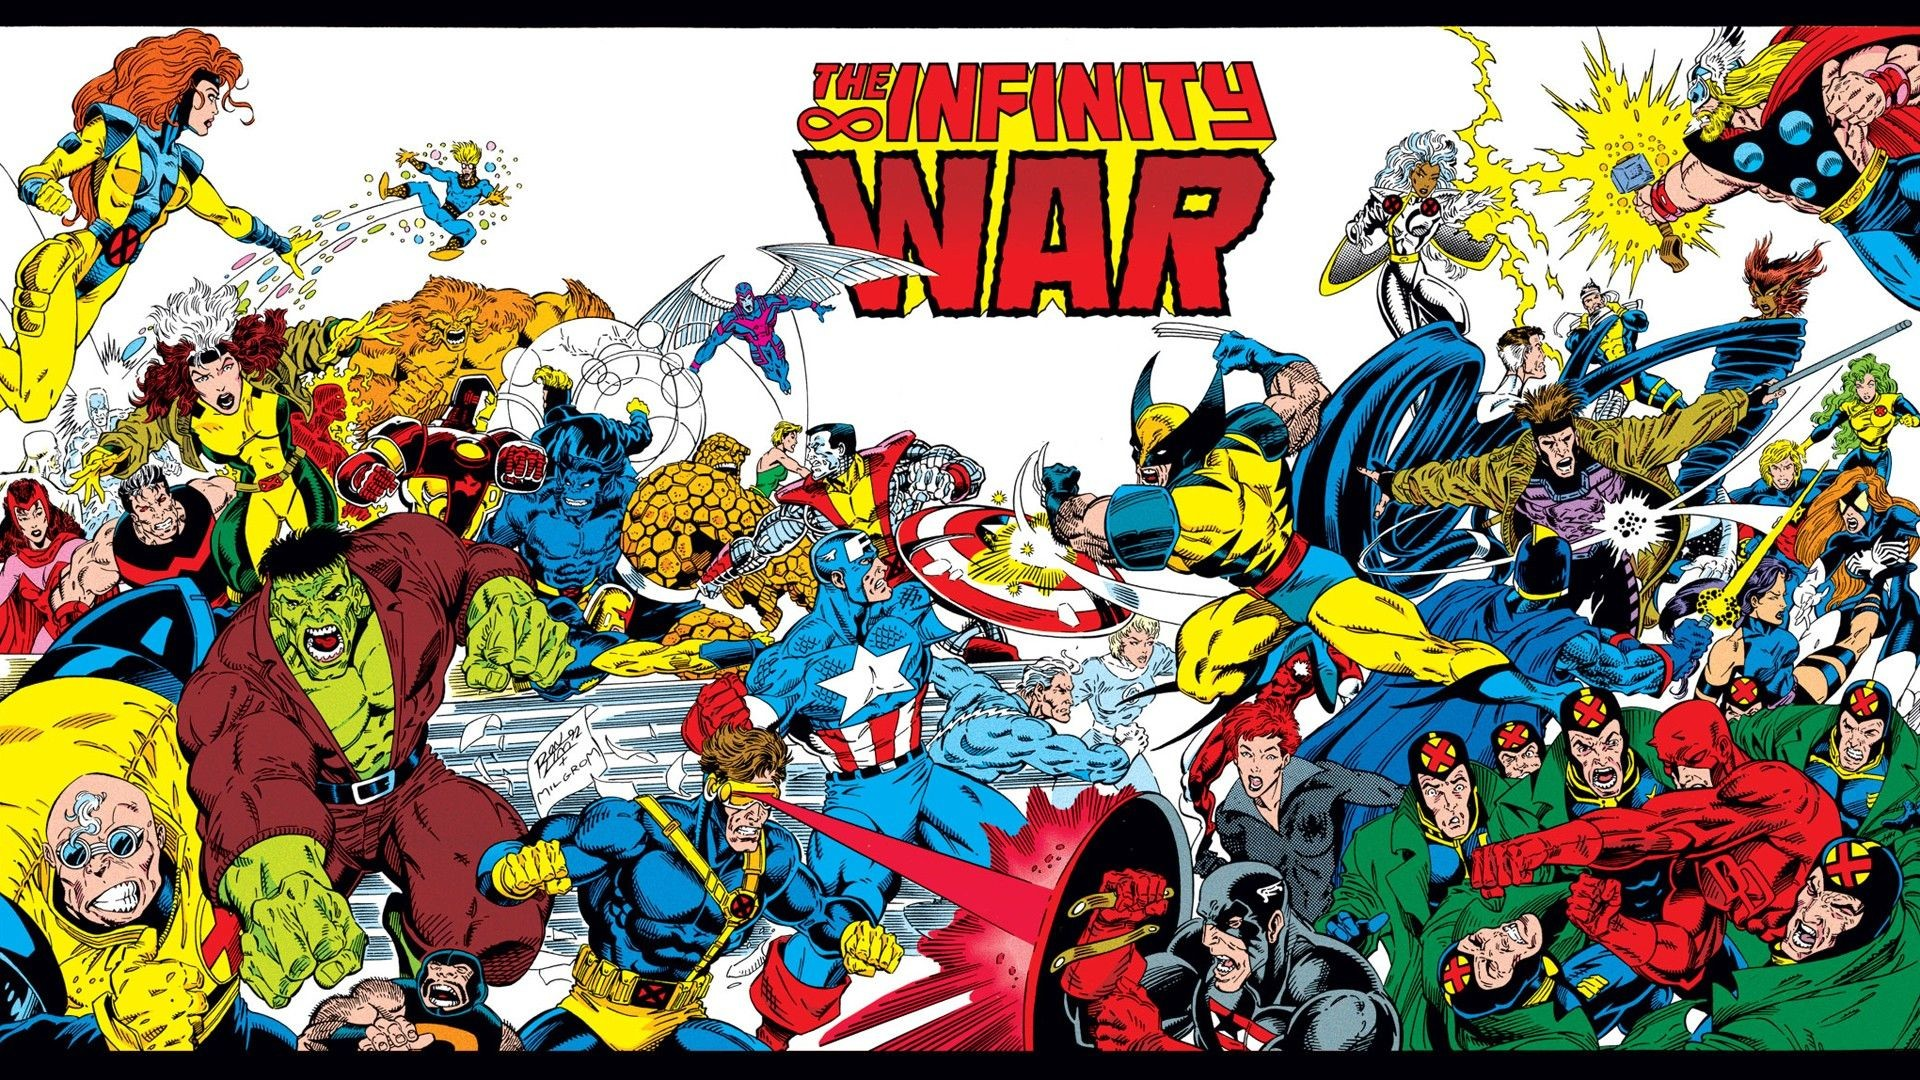 Res: 1920x1080, The Avengers, X Men, Wolverine, Comics Wallpaper